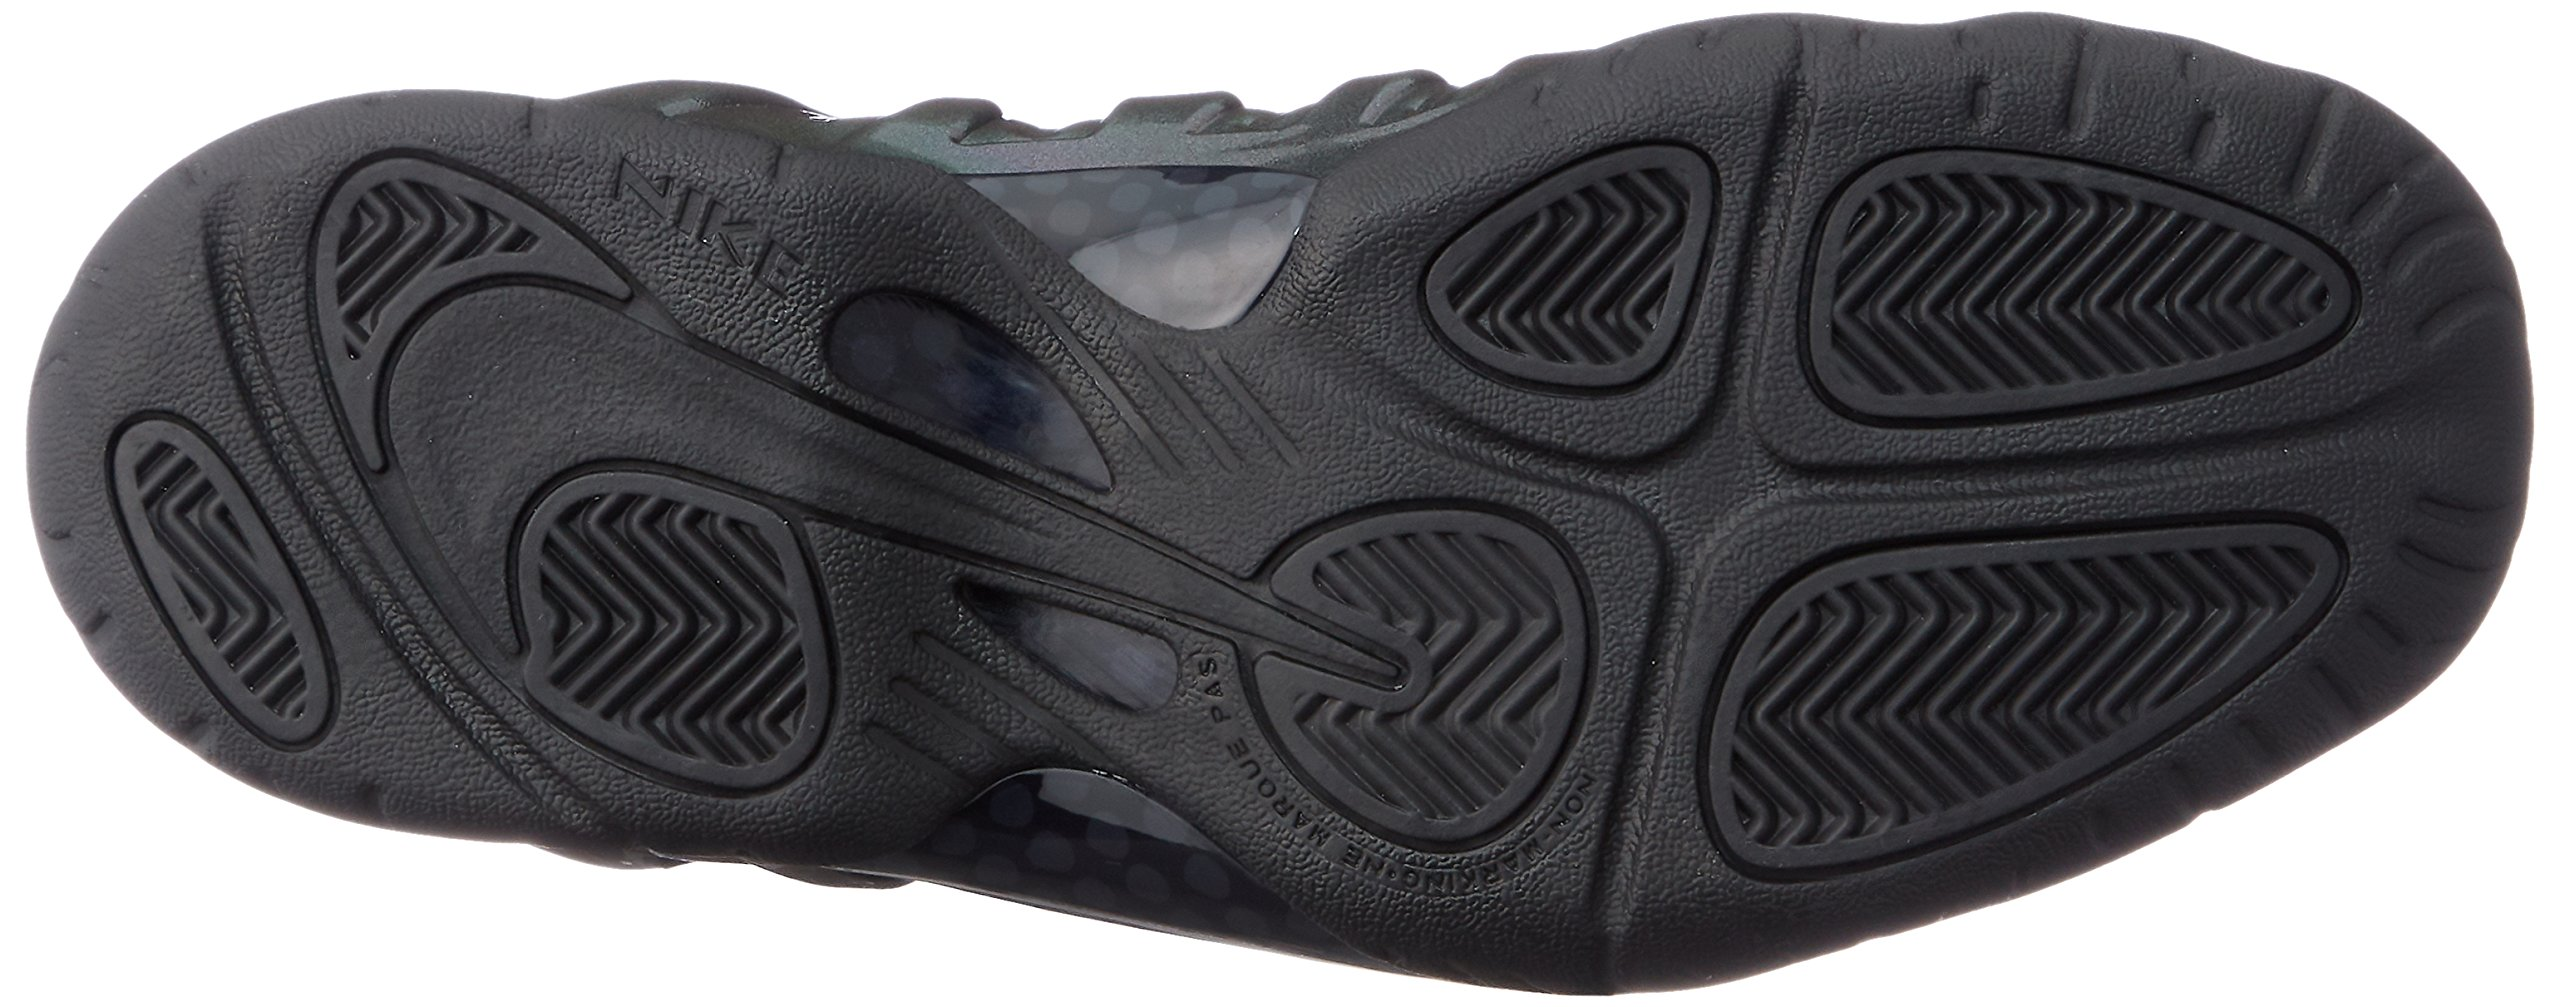 Nike Little Posite One (GS) 644791-301 Legion Green/Black Kids Shoes (6Y) by Nike (Image #3)